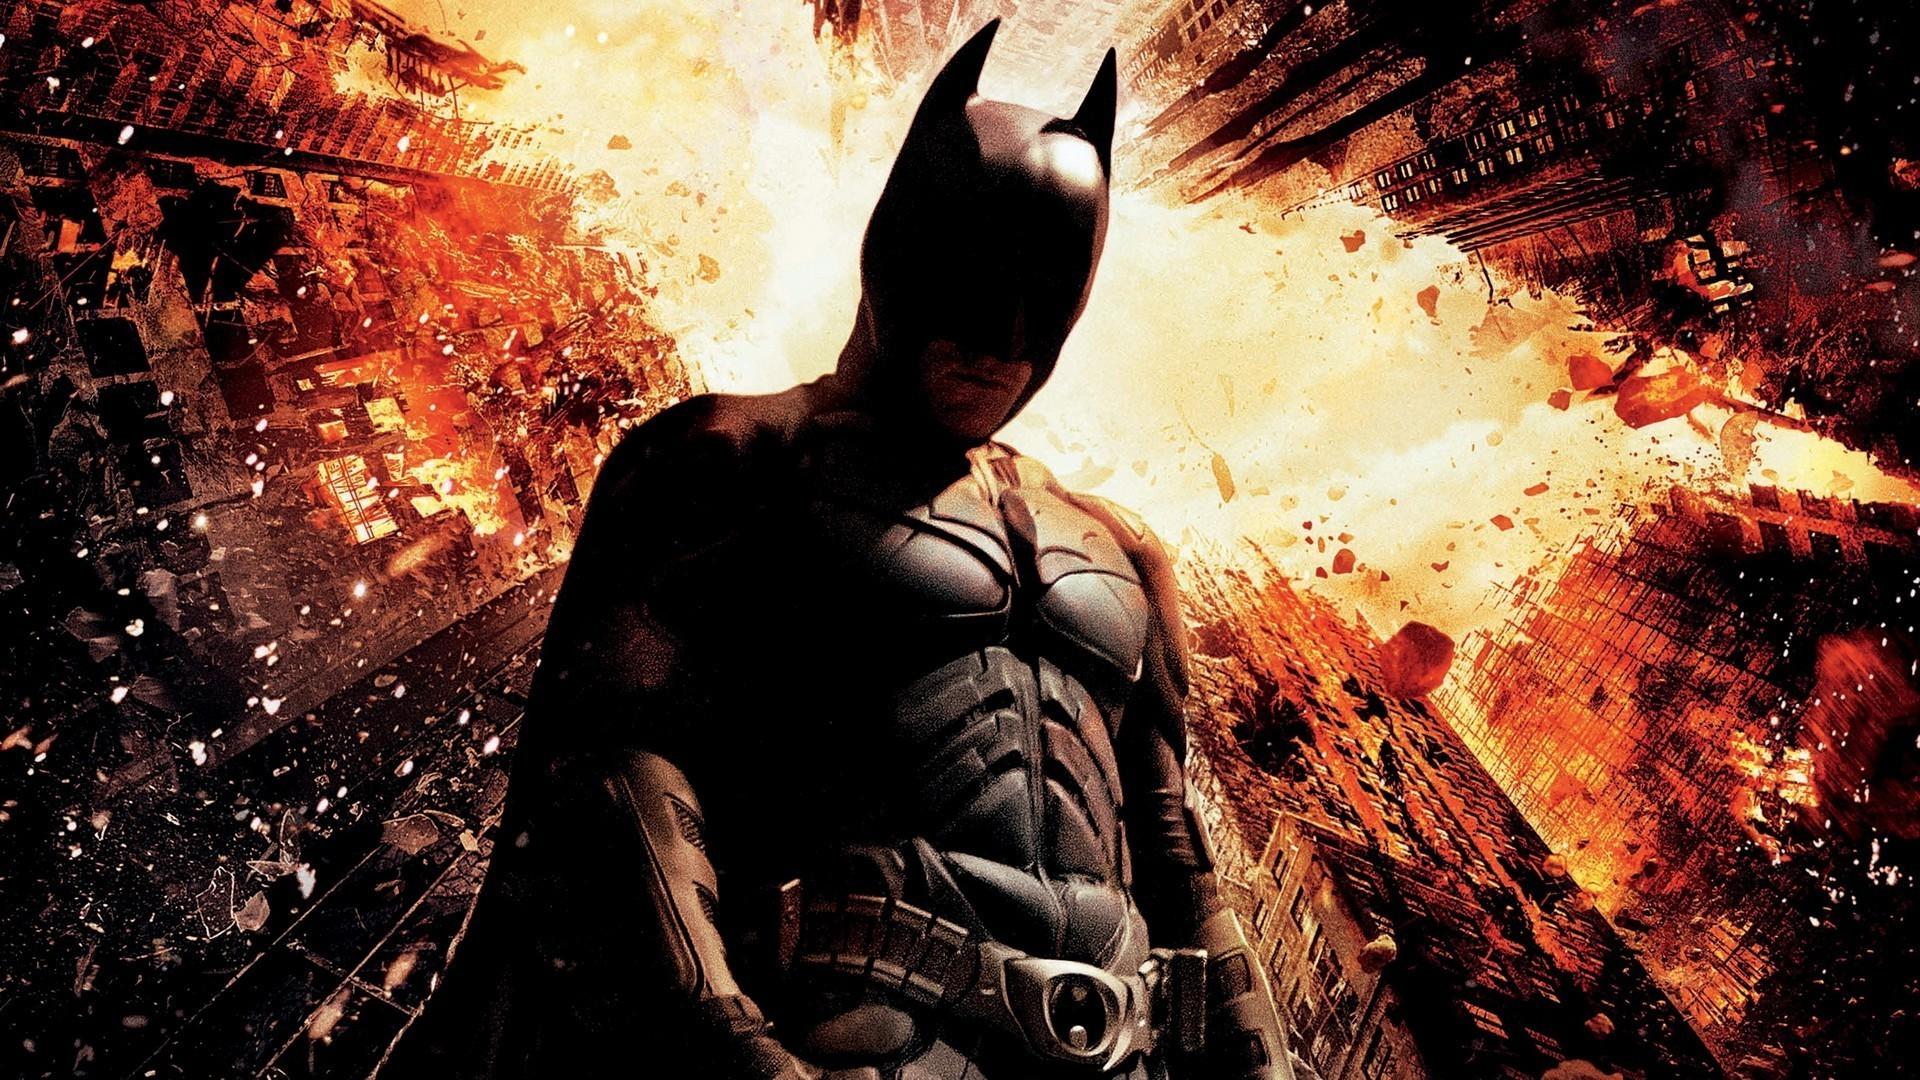 movies The Dark Knight Rises Batman Wallpapers HD Desktop and